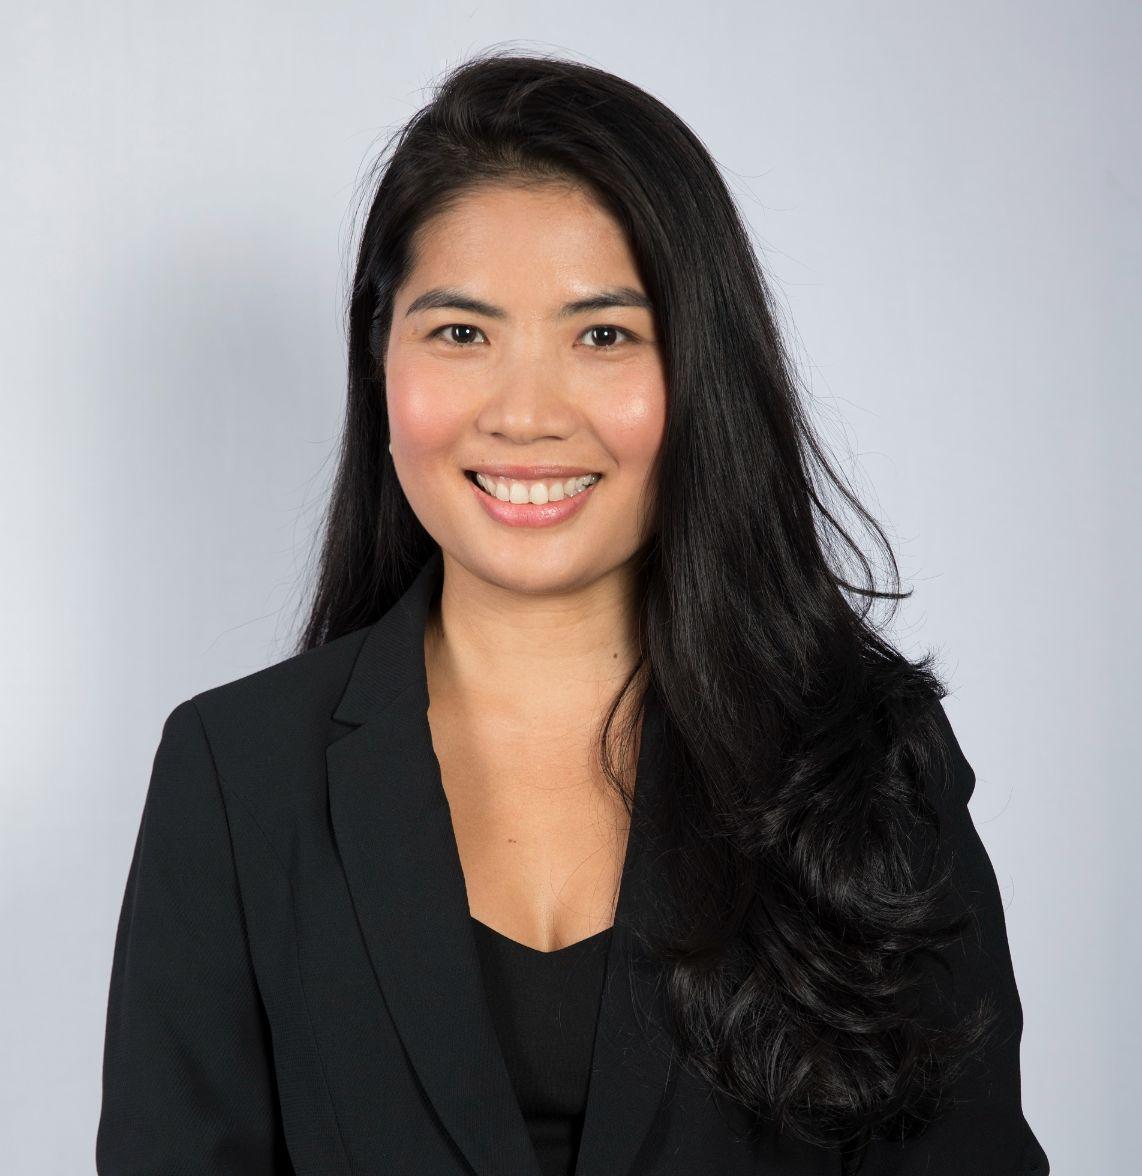 Trang Bui Jll (1)